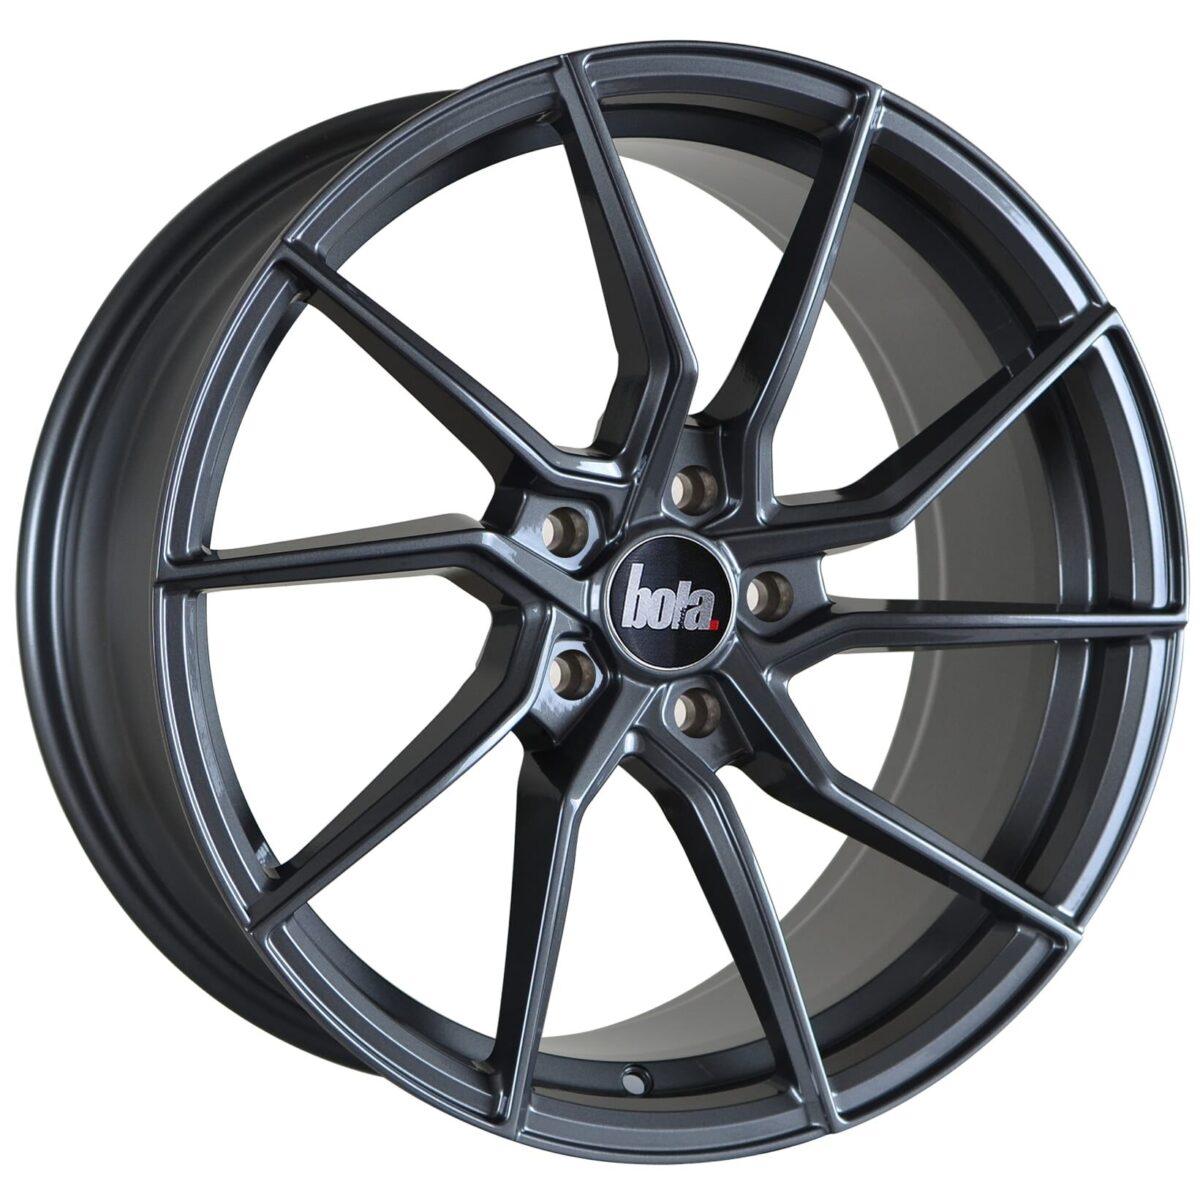 "18"" BOLA B25 Wheels - Gloss Gunmetal - All BMW Models"